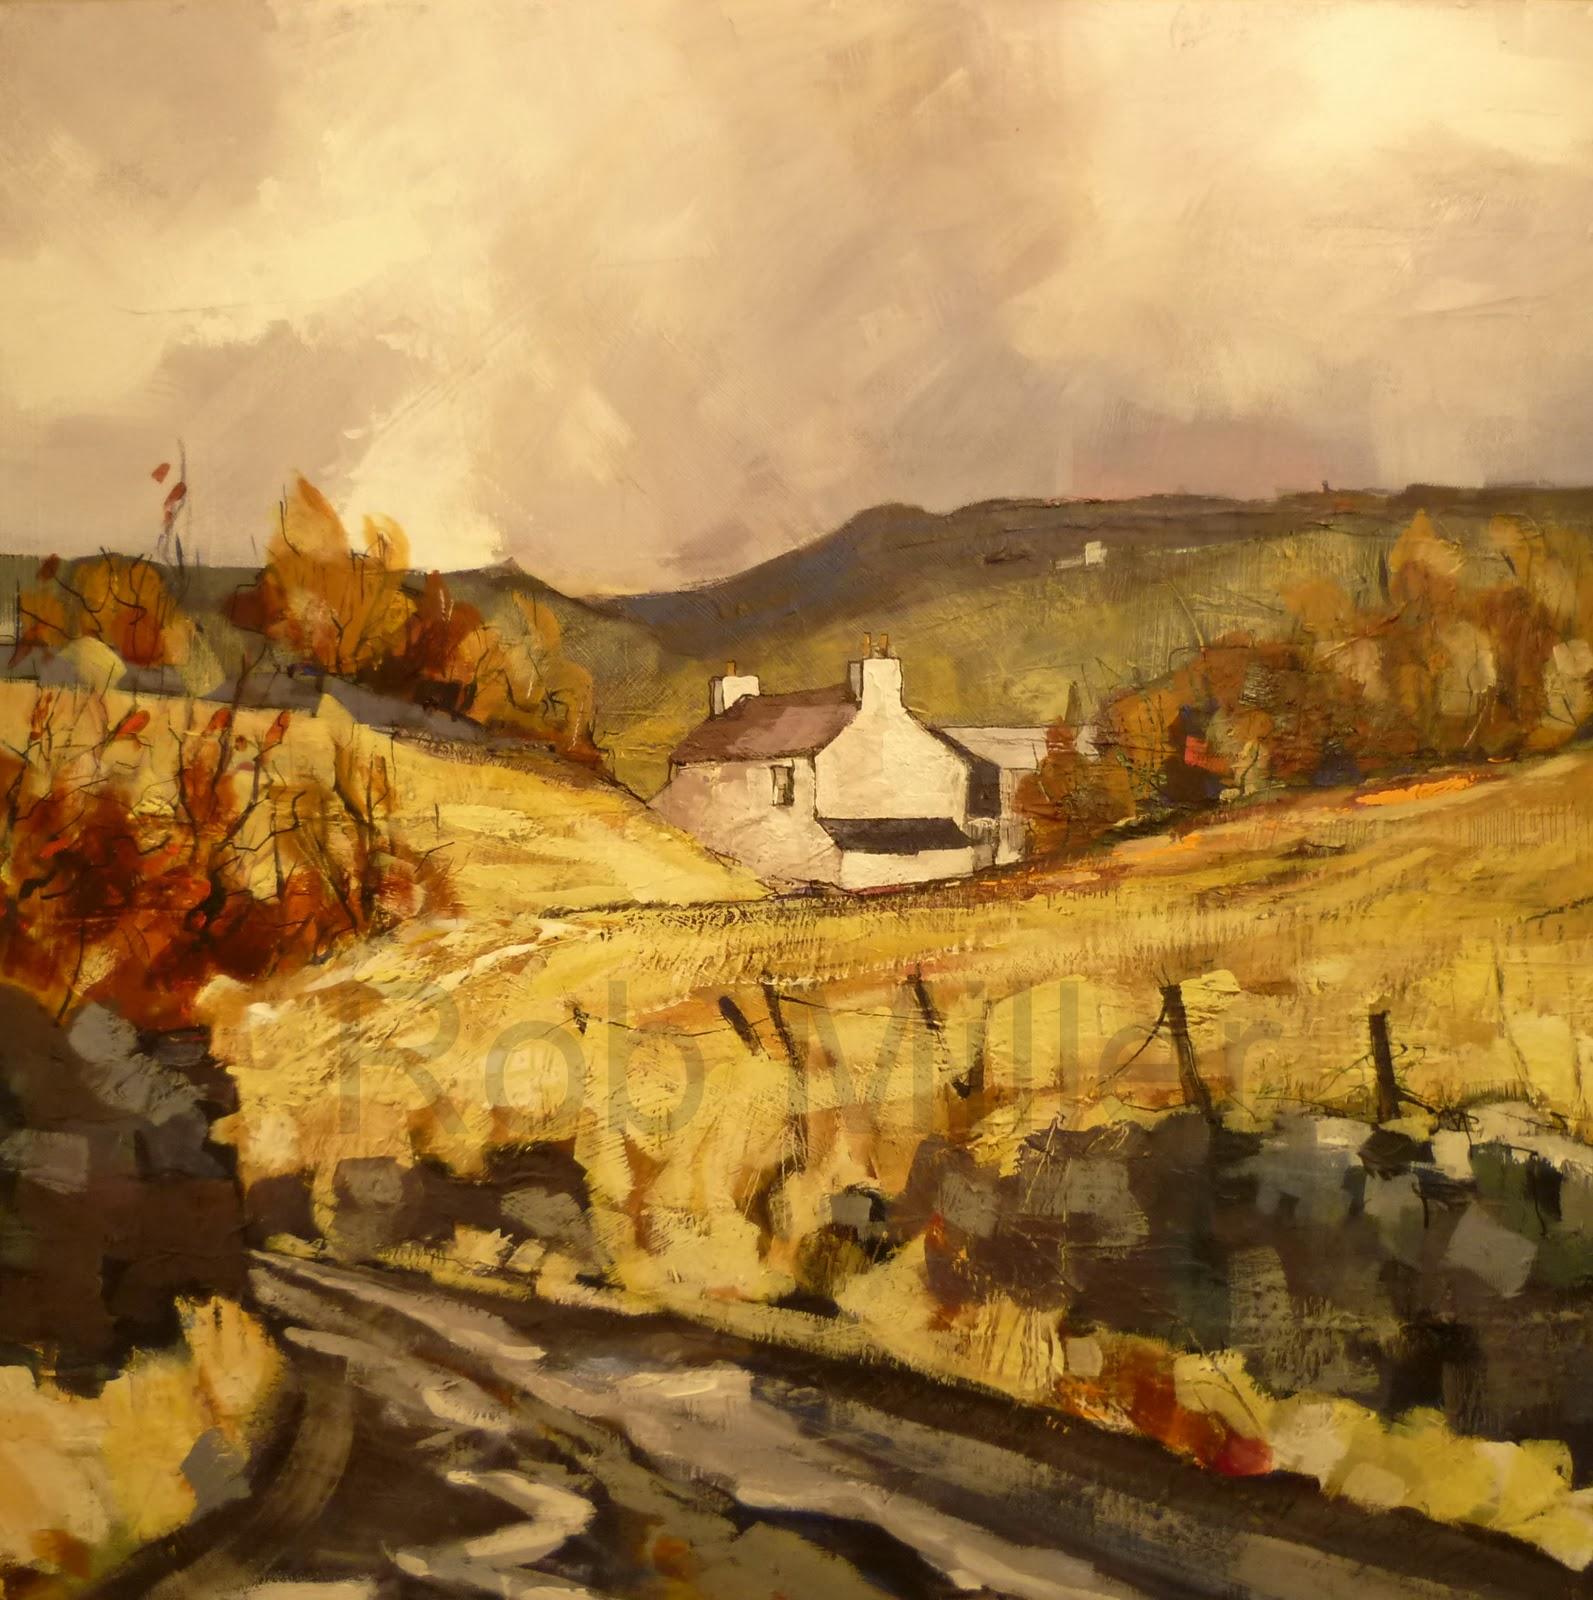 http://1.bp.blogspot.com/-H_xBZNGMfEQ/TYOk6bsBDzI/AAAAAAAAqSU/DrddYbH3rqc/s1600/Miners+Track%252C++Lancashire+painting+by+Rob+Miller.jpg